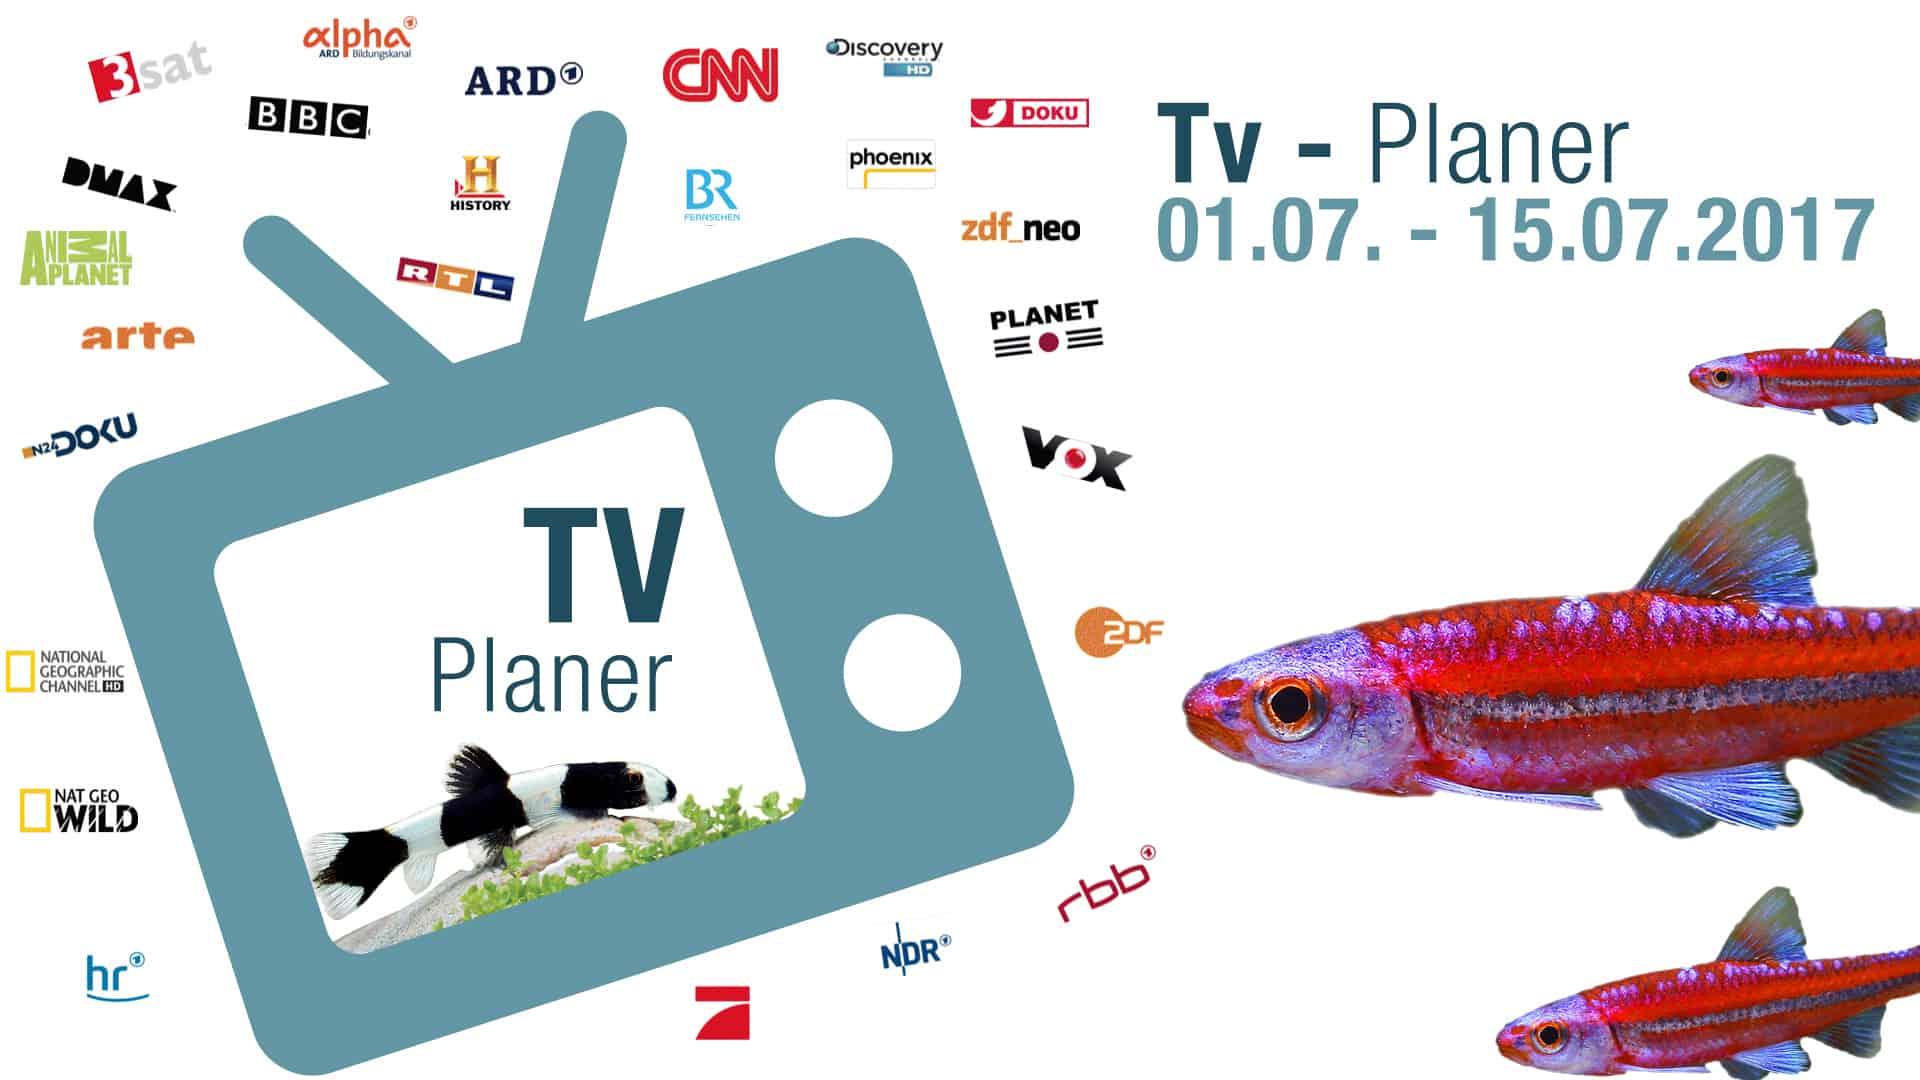 TV-Liste vom 01.07. - 15.07.2017 1